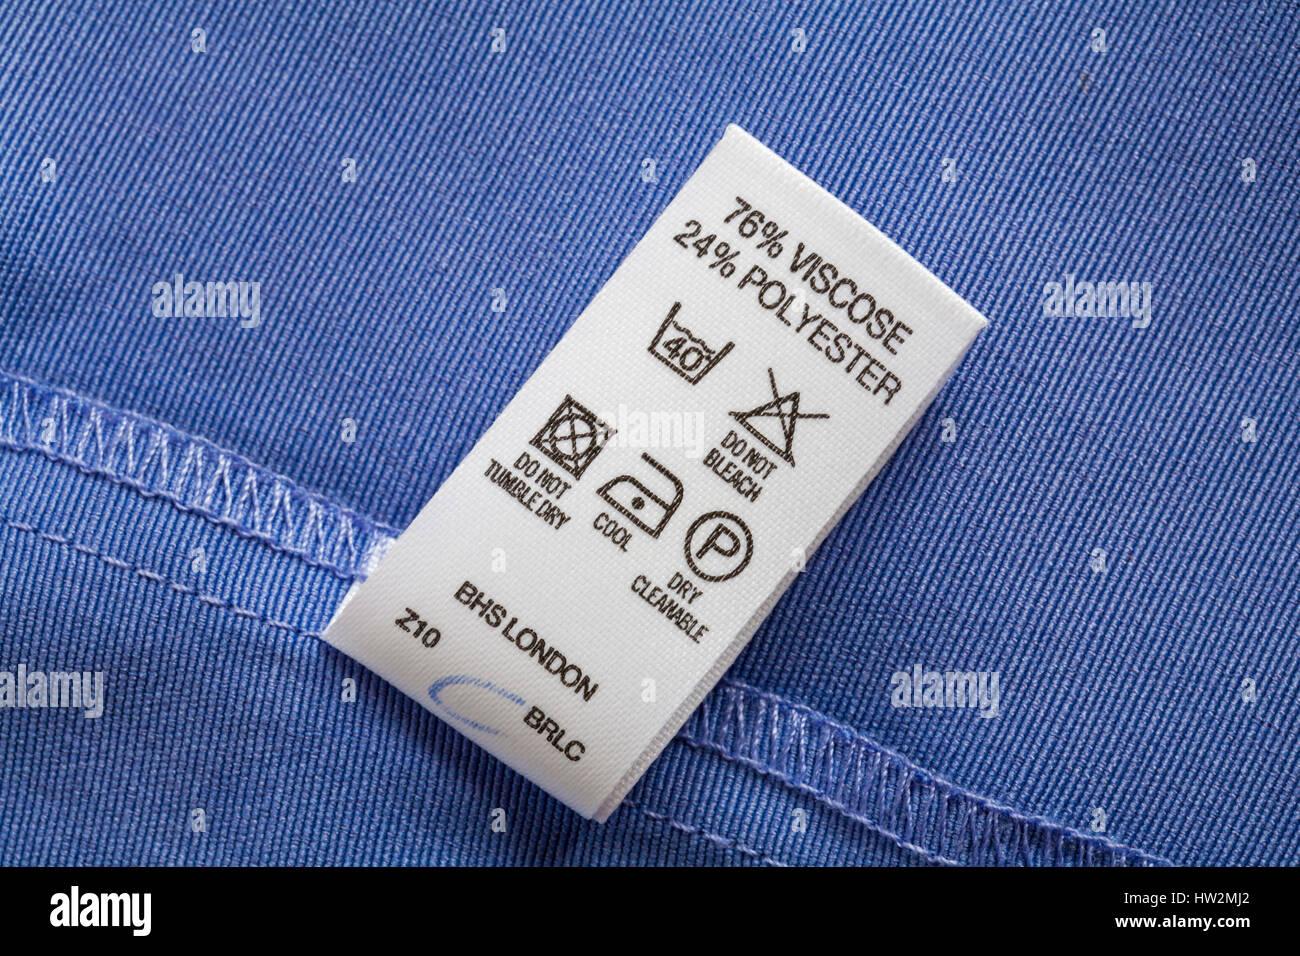 polyester chiffon care instructions